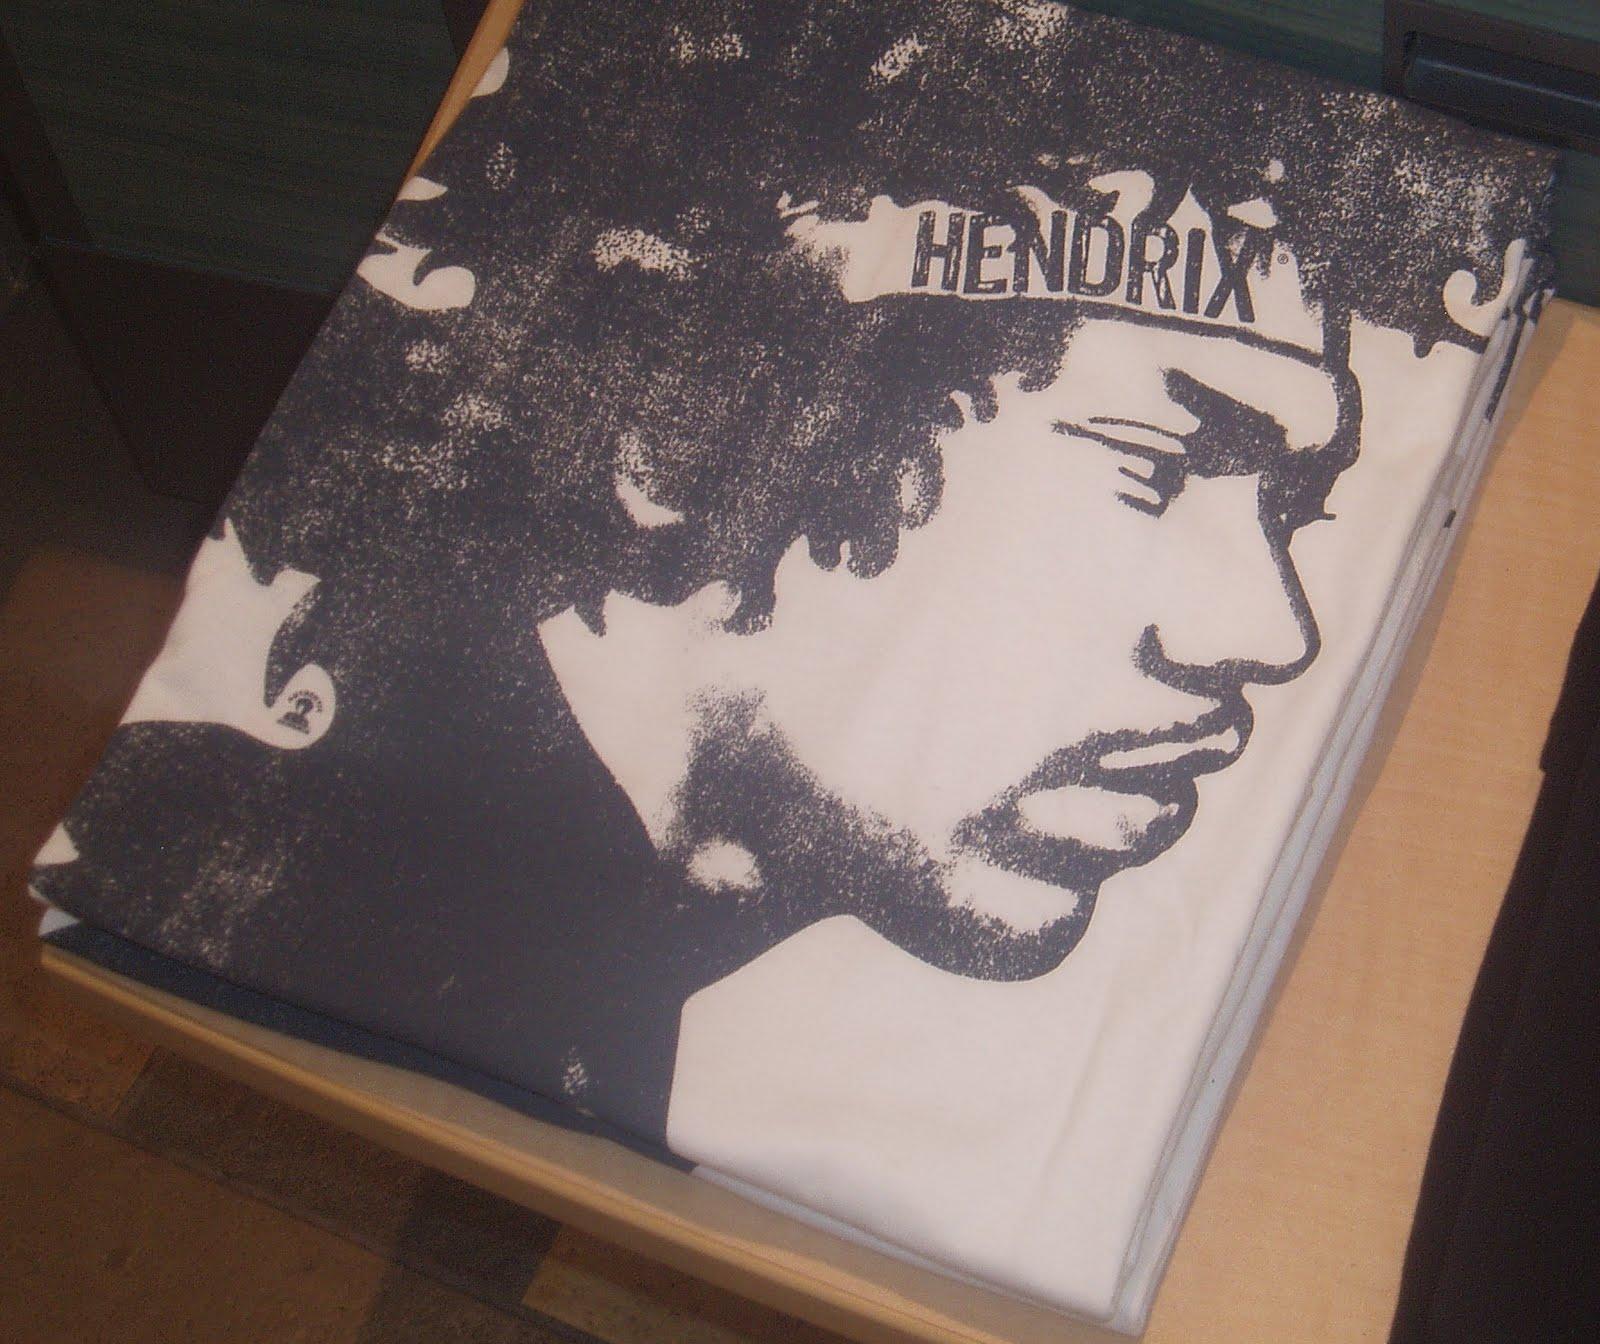 Hd Wallpapers Hd Jimi Hendrix Wallpaper Pack